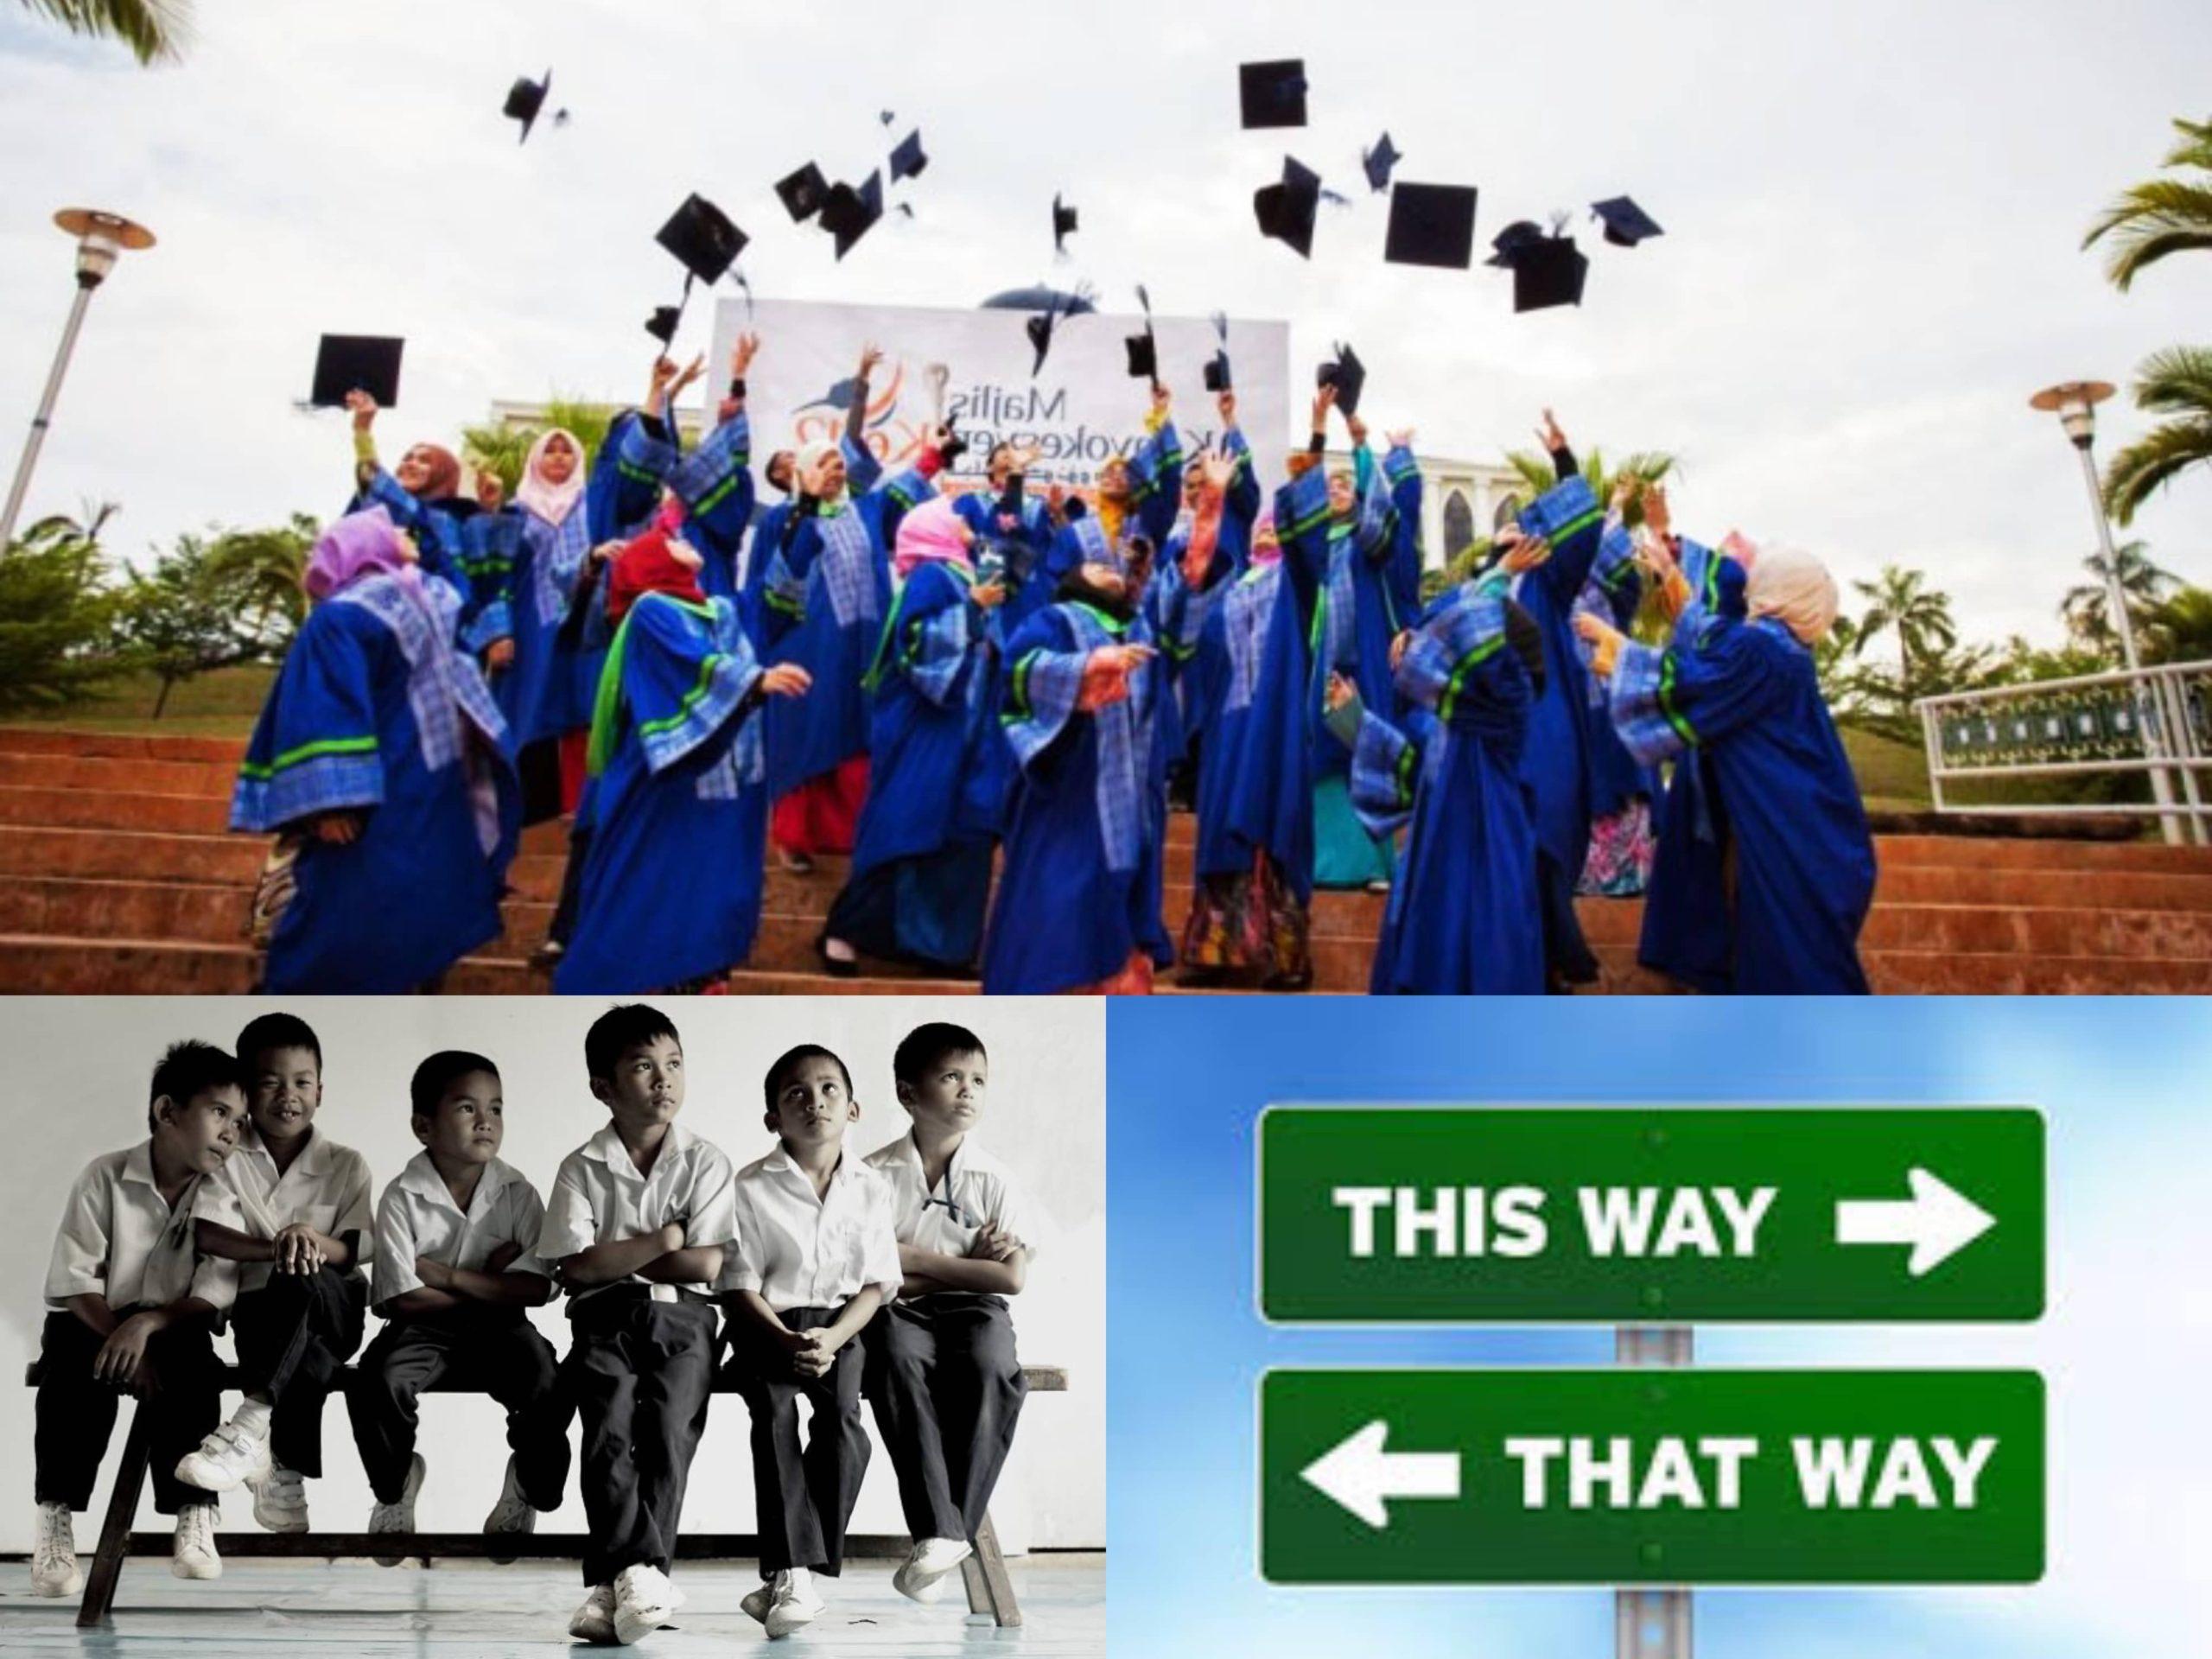 Diploma, Matrikulasi Atau Asasi? Mana Satu Yang Lebih Sesuai